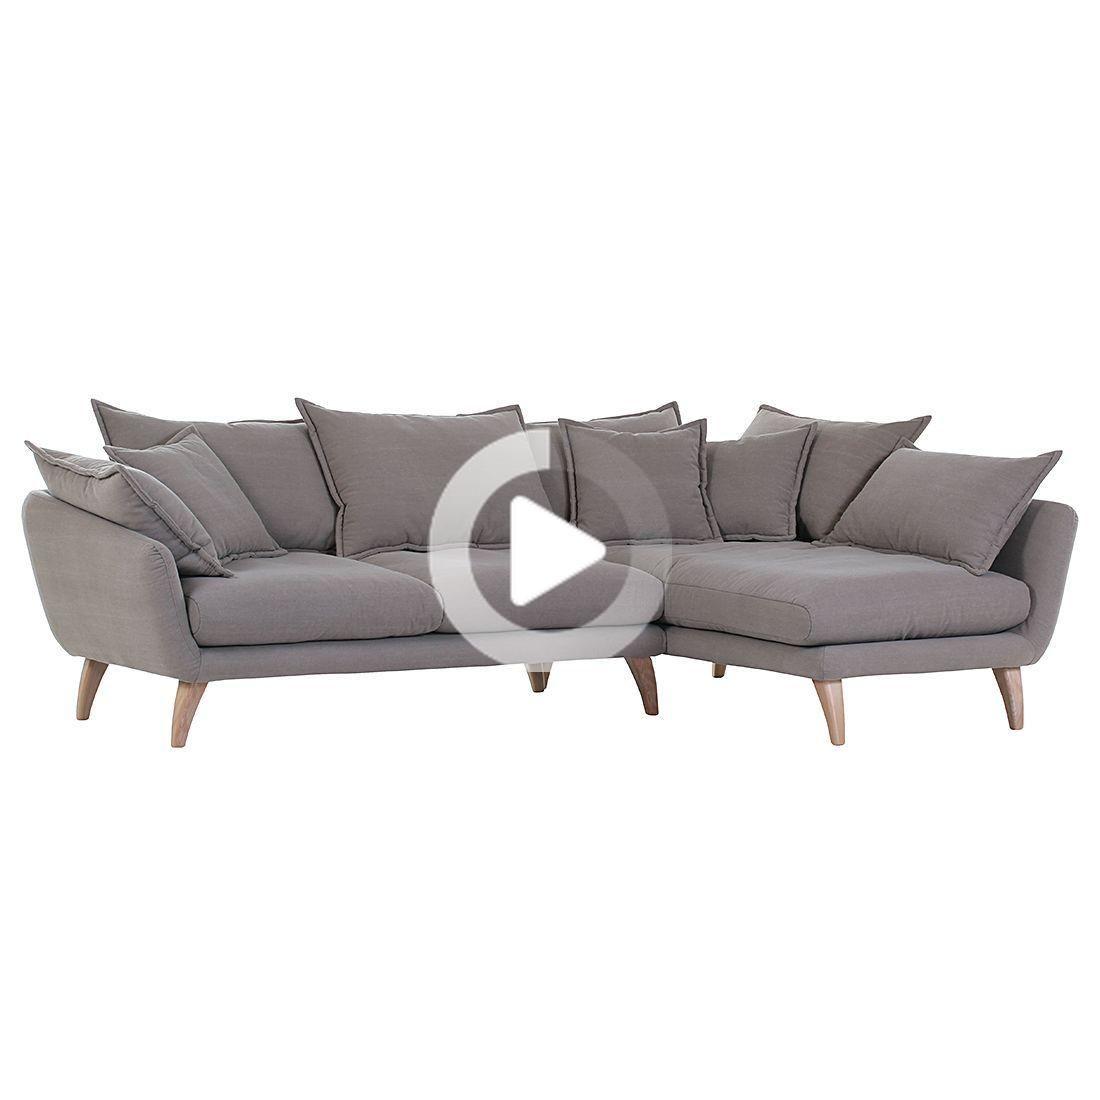 Norrwood Ecksofa Valby 2 Sitzer Grau Webstoff 267x66x170 Cm In 2020 Corner Sofa Beautiful Sofas Sofa